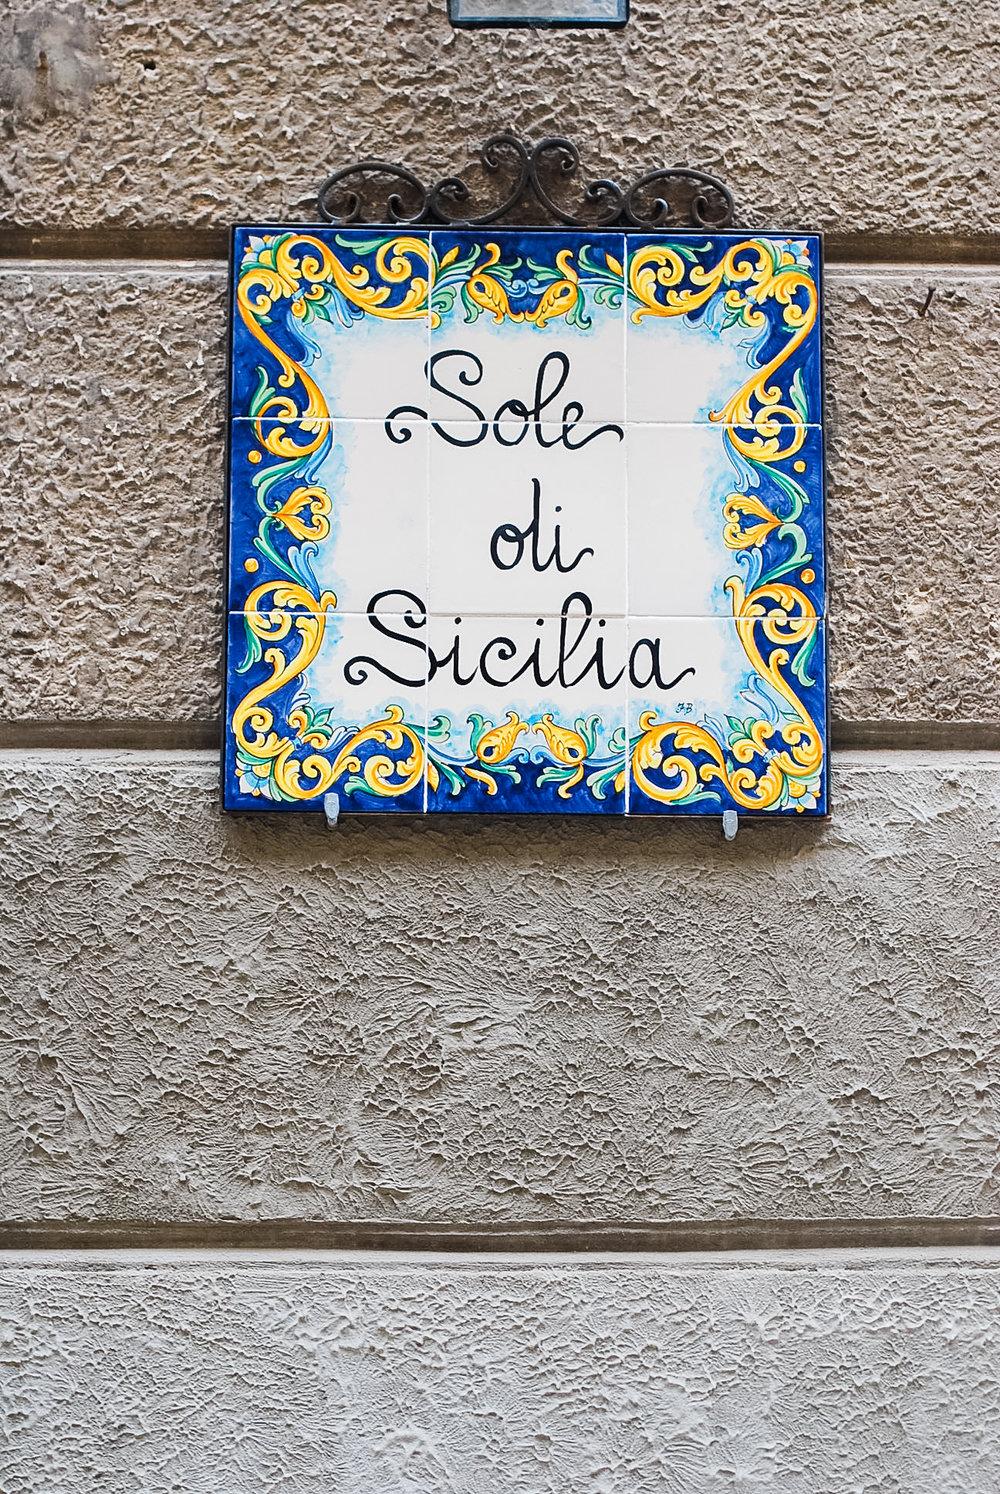 Sicily-24.jpg